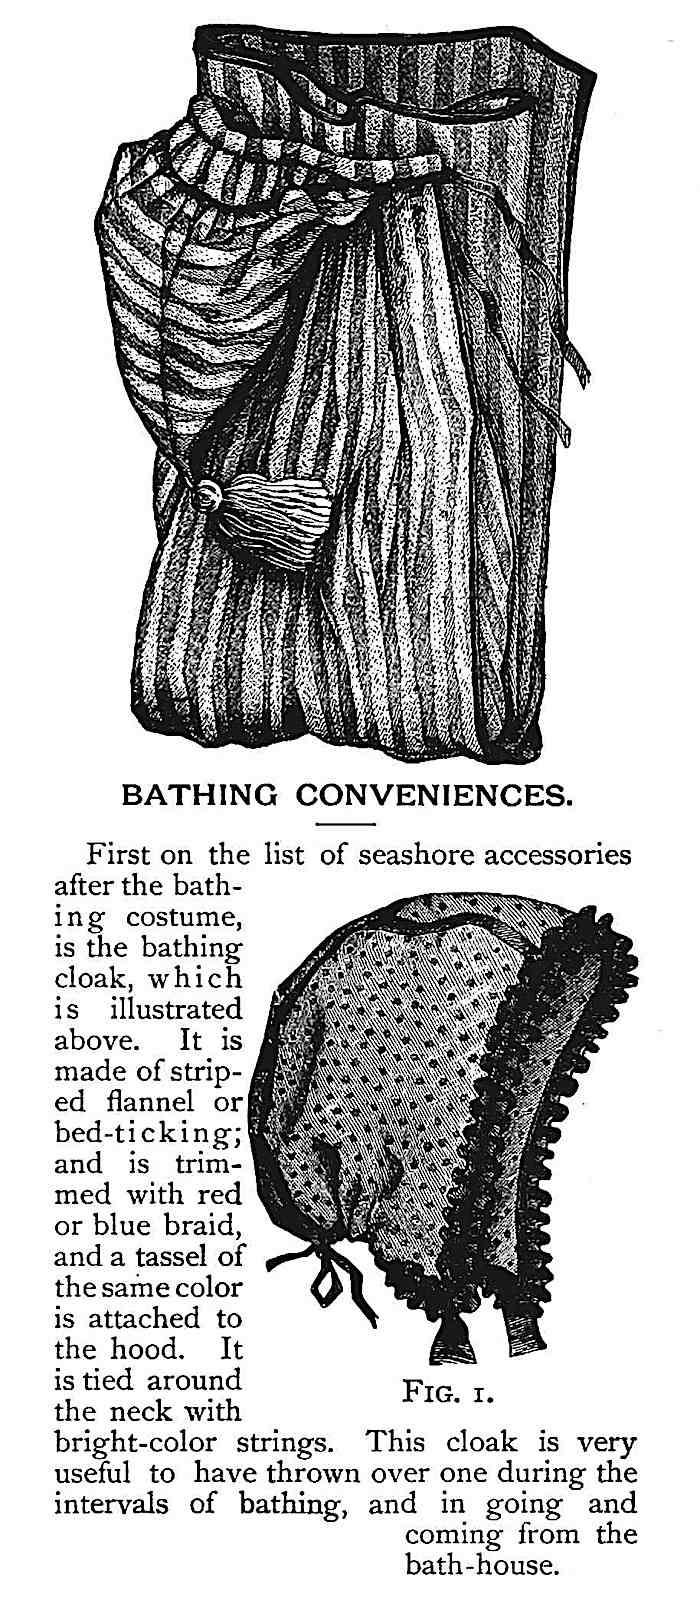 1883 women's swimwear advertisement